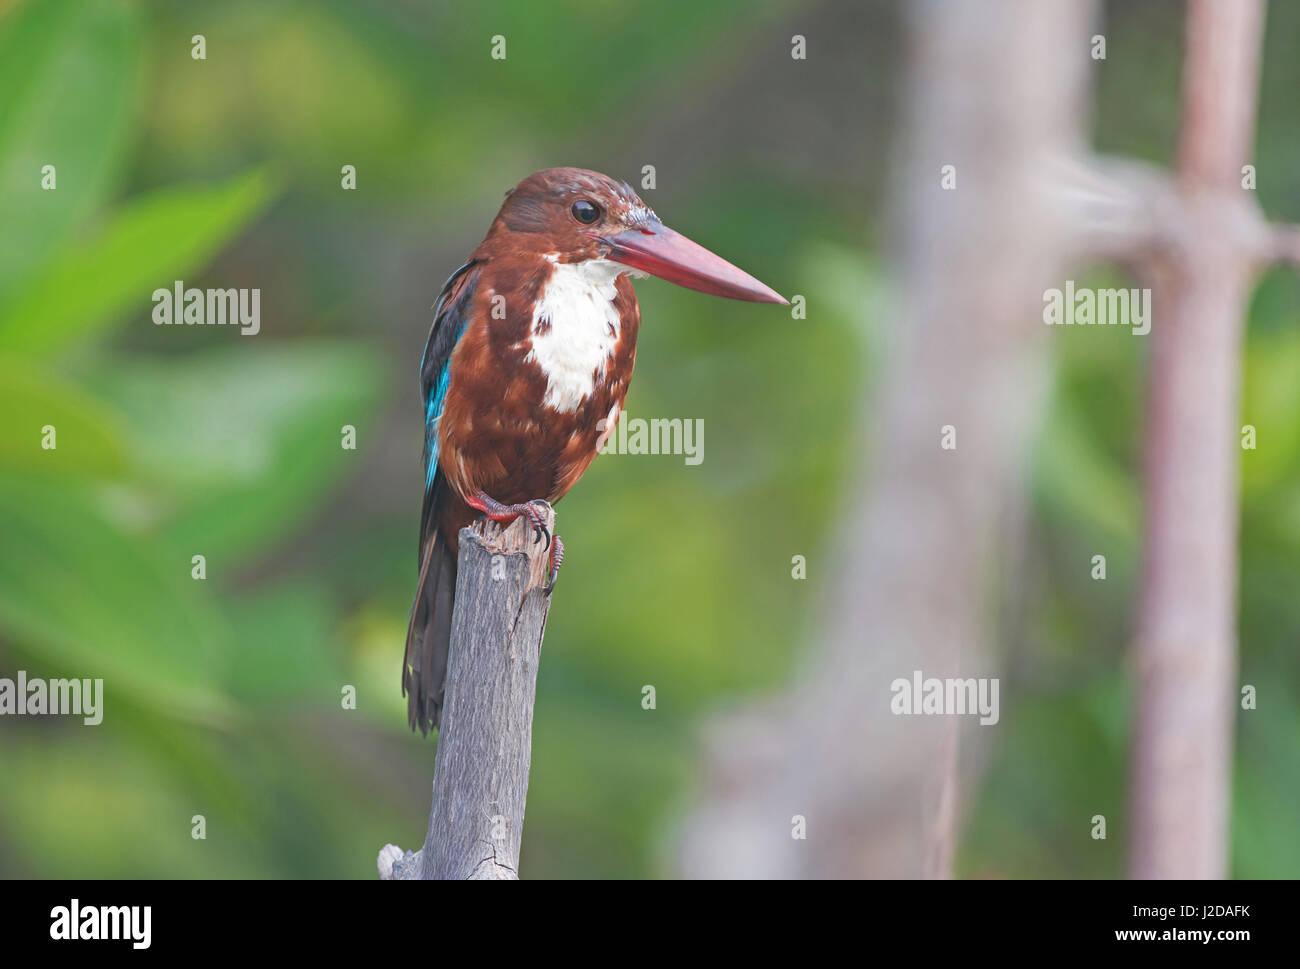 White throated kingfisher - Stock Image